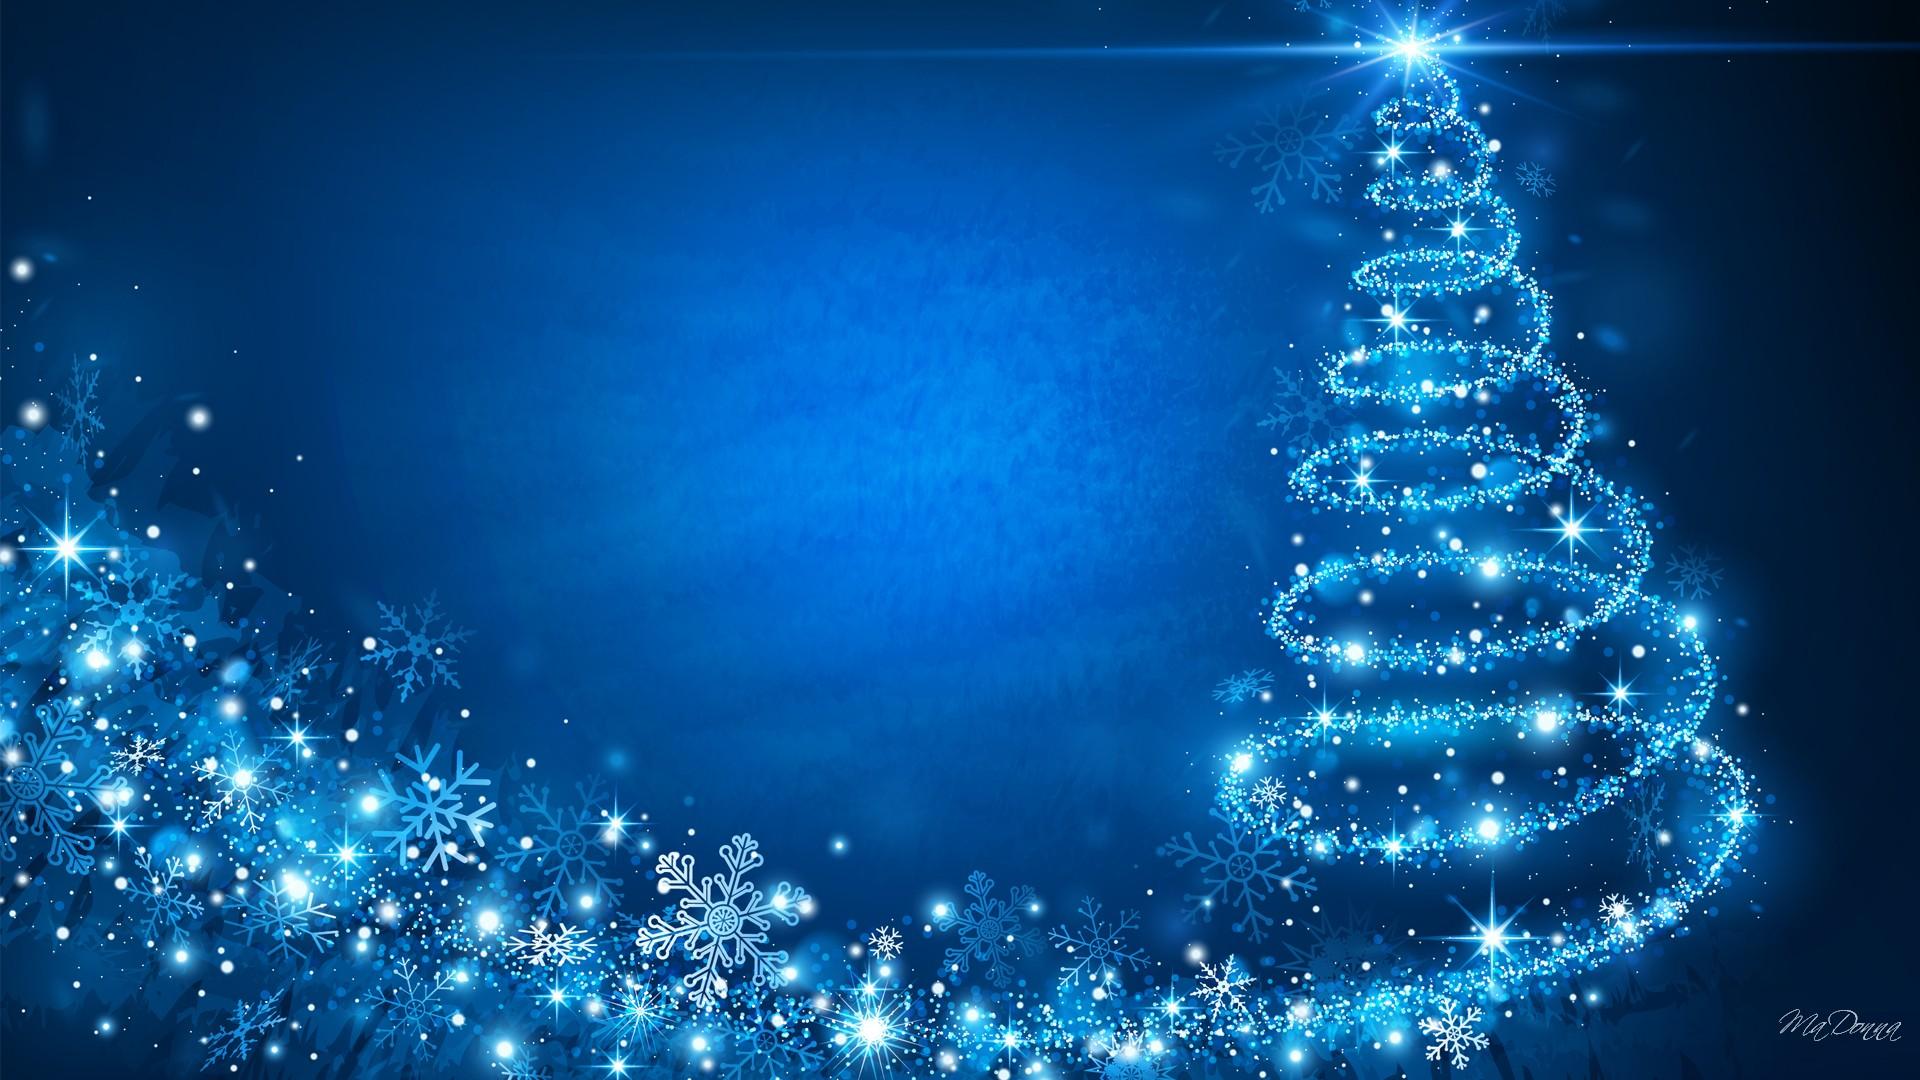 Christmas Background Wallpapers 16313   Baltana 1920x1080